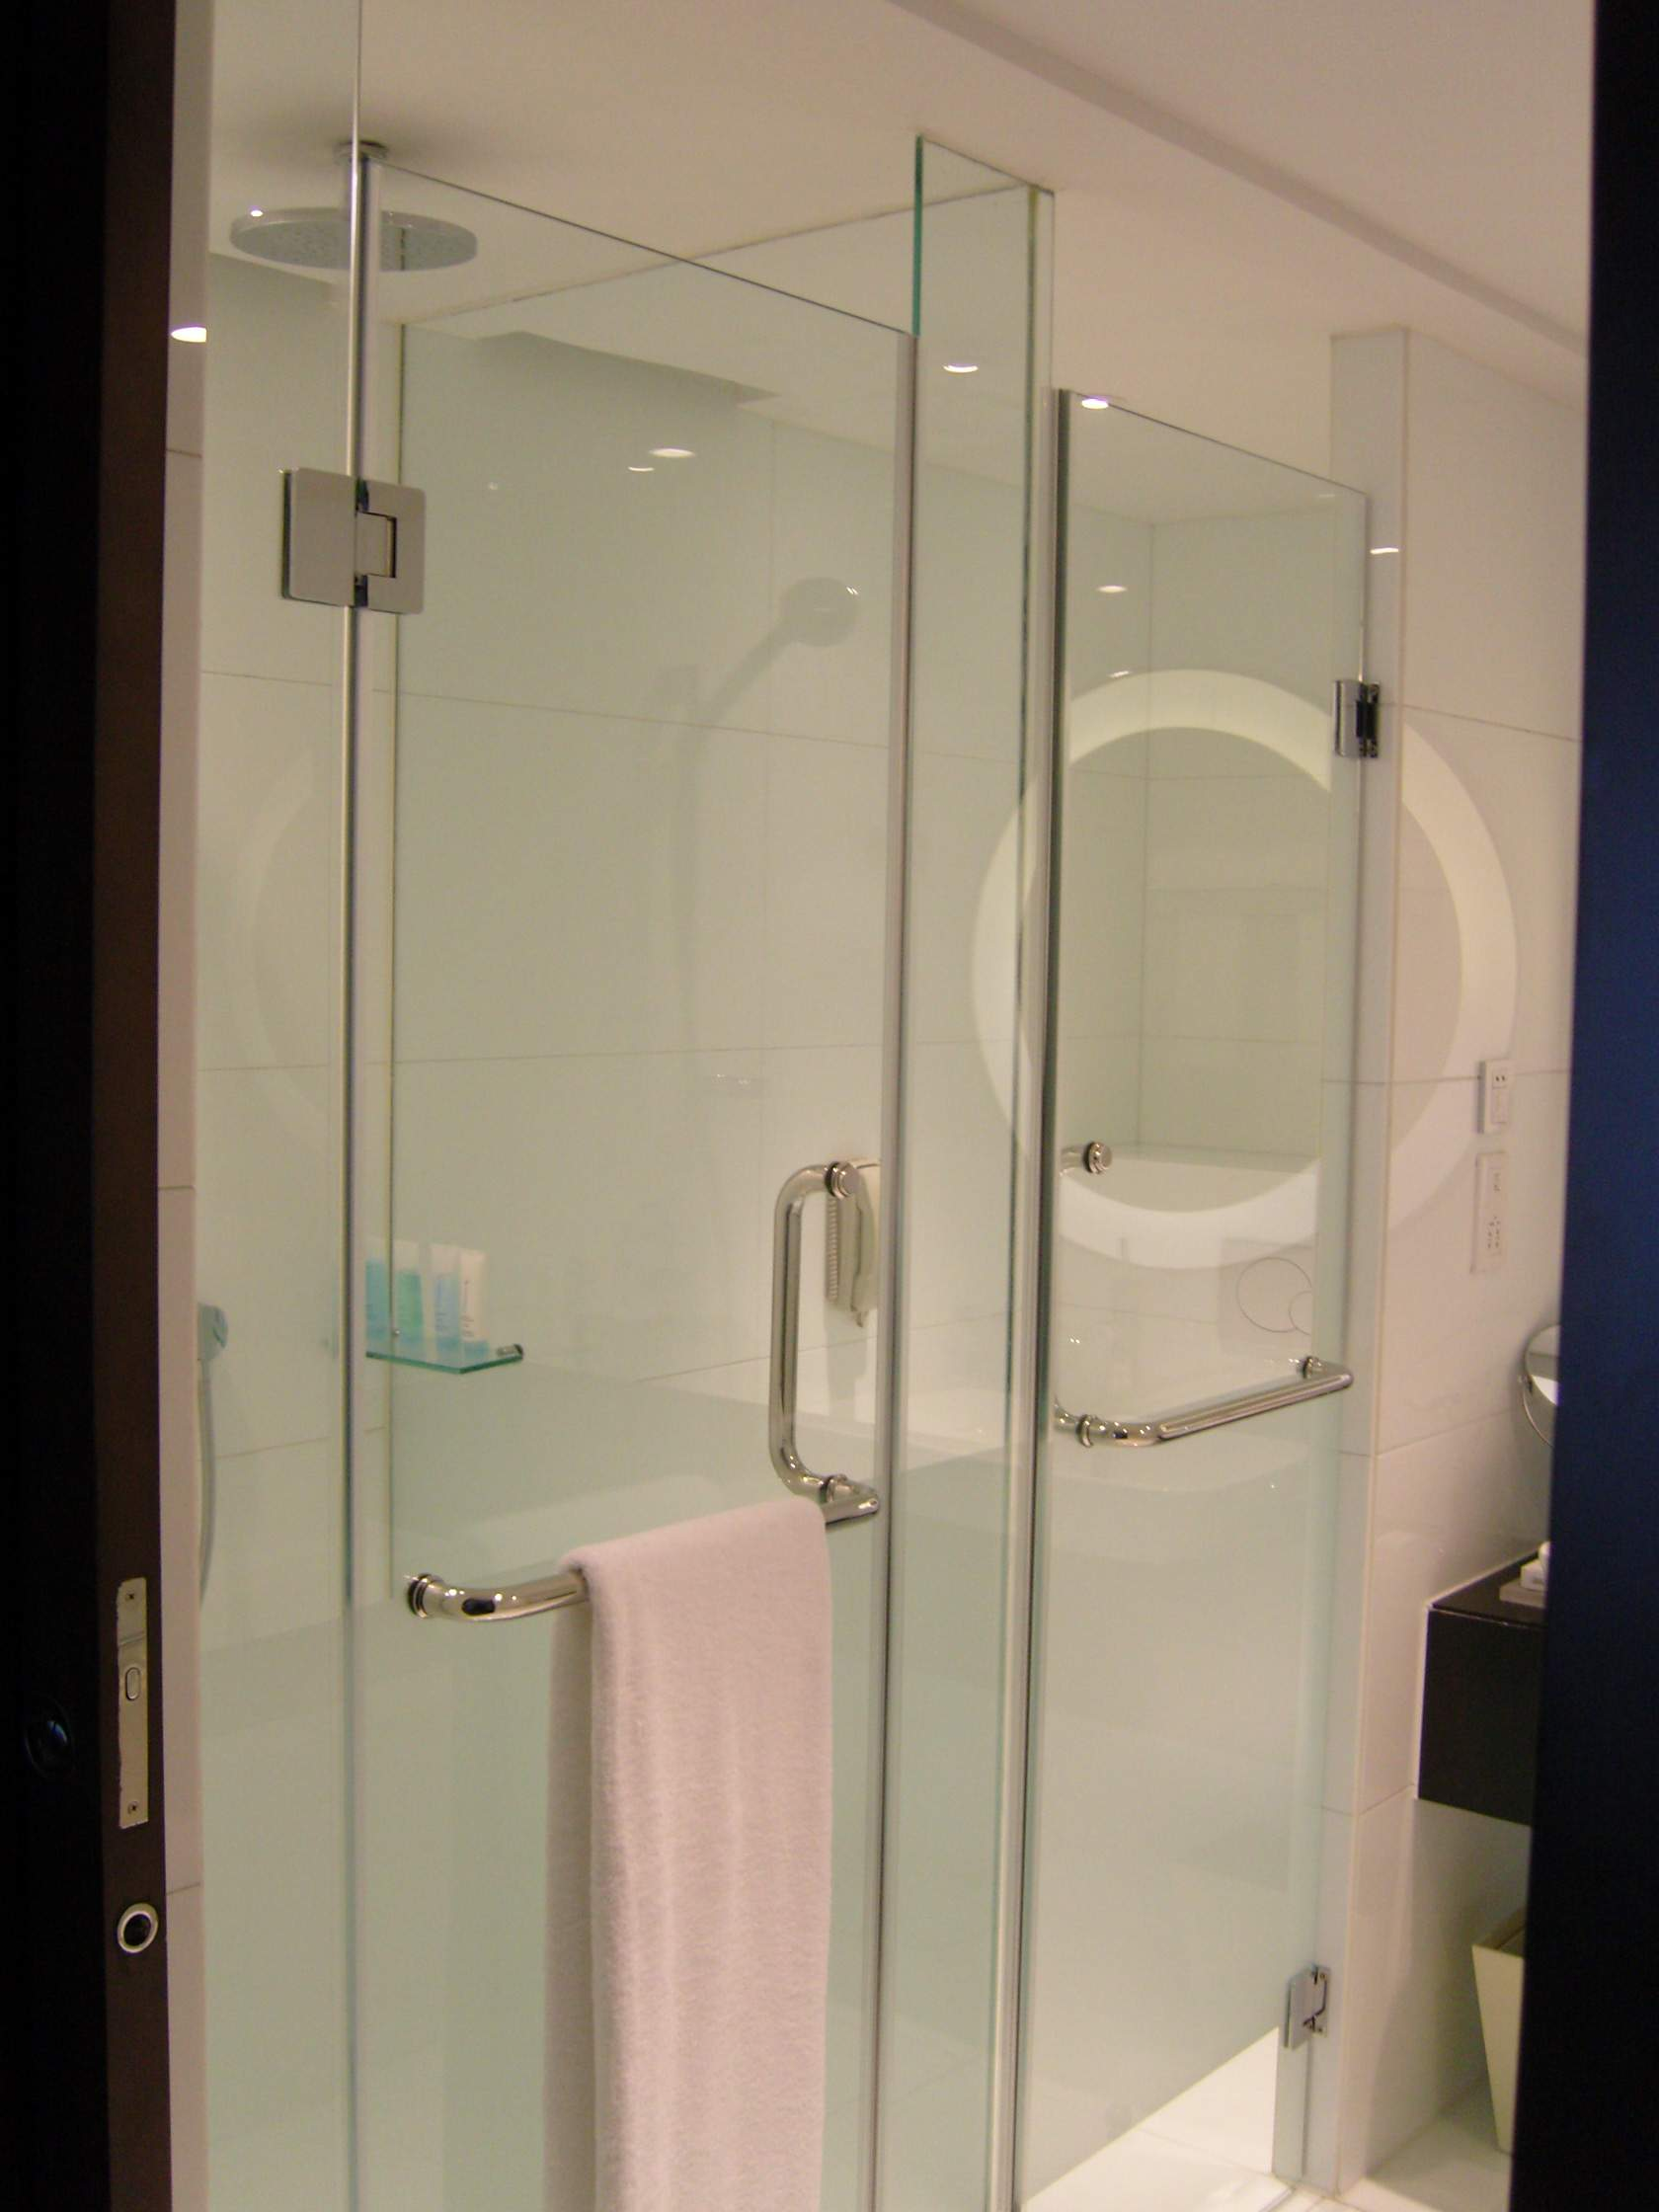 Shower Screen Specialist in Singapore - Frameless Design